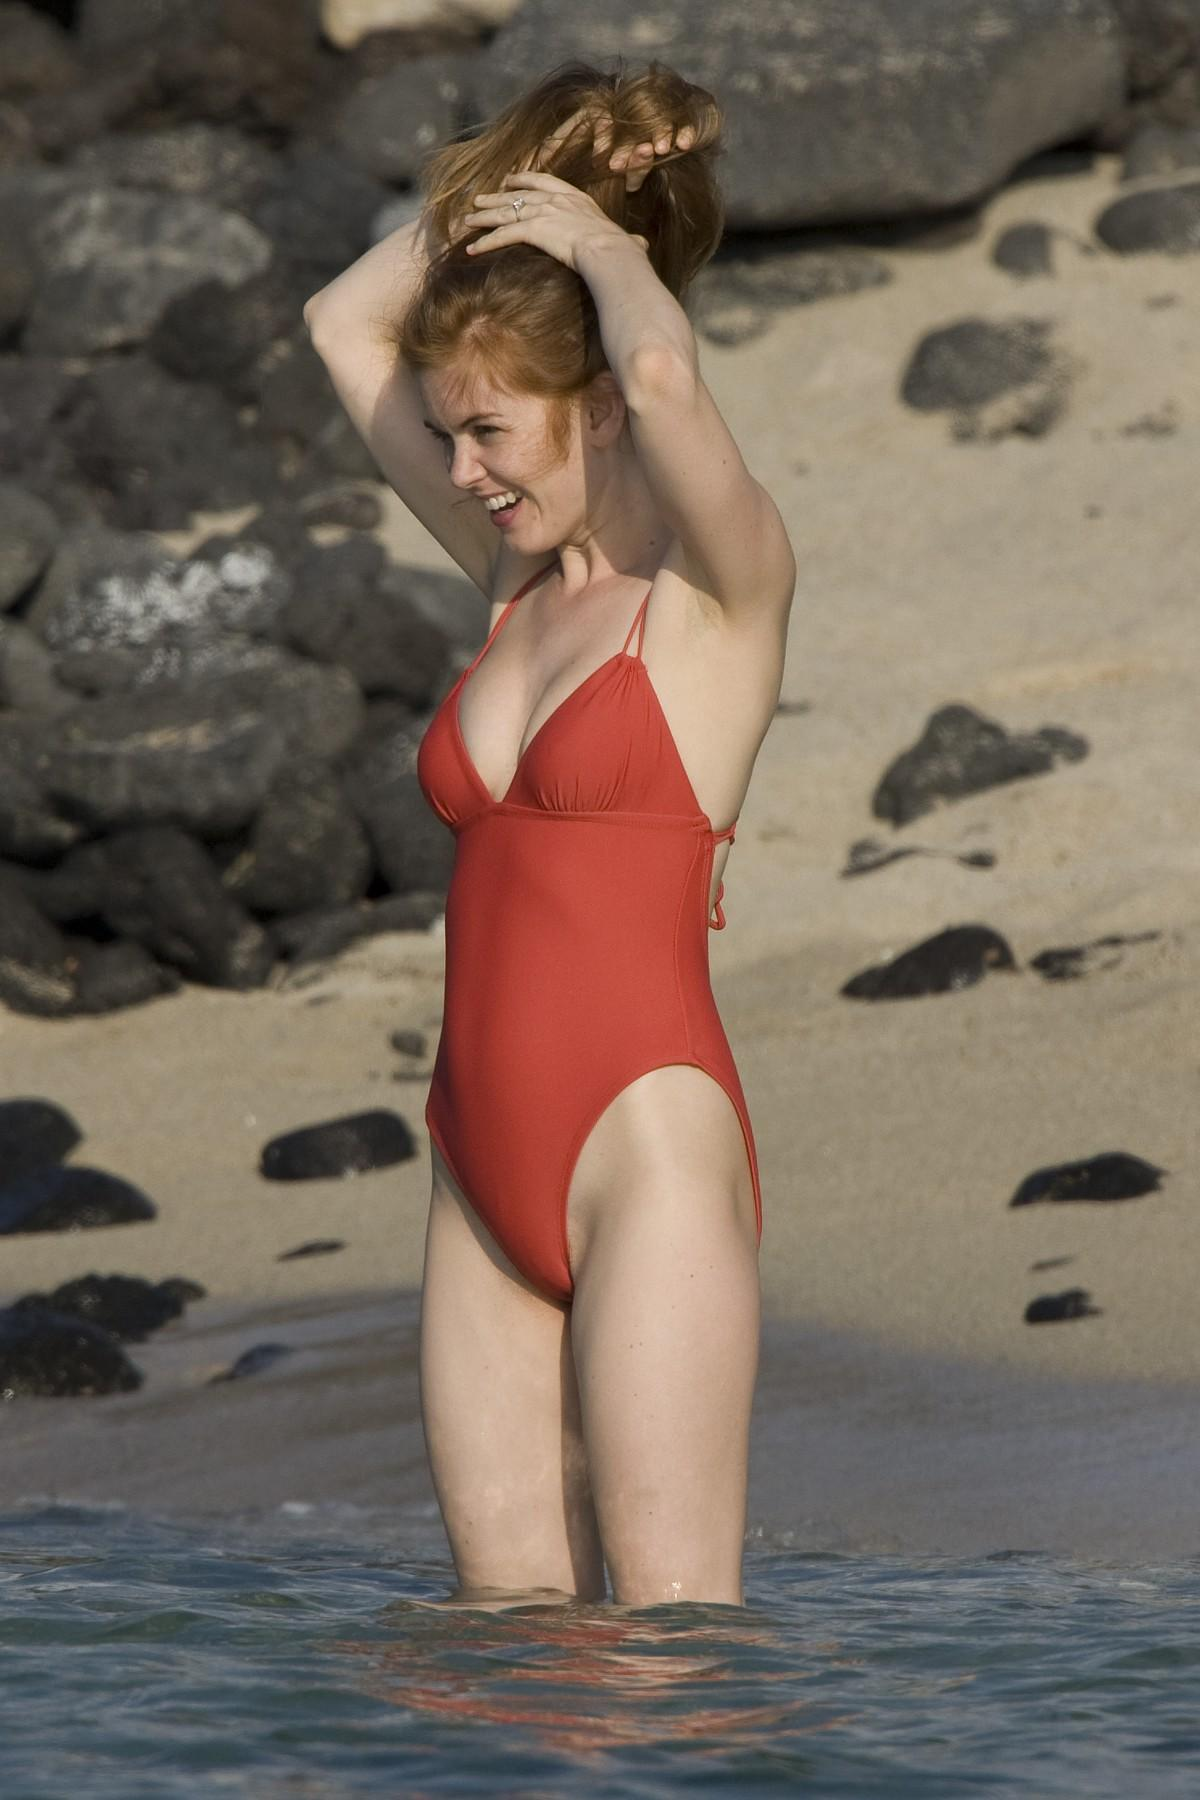 Isla fisher desnuda Cultture